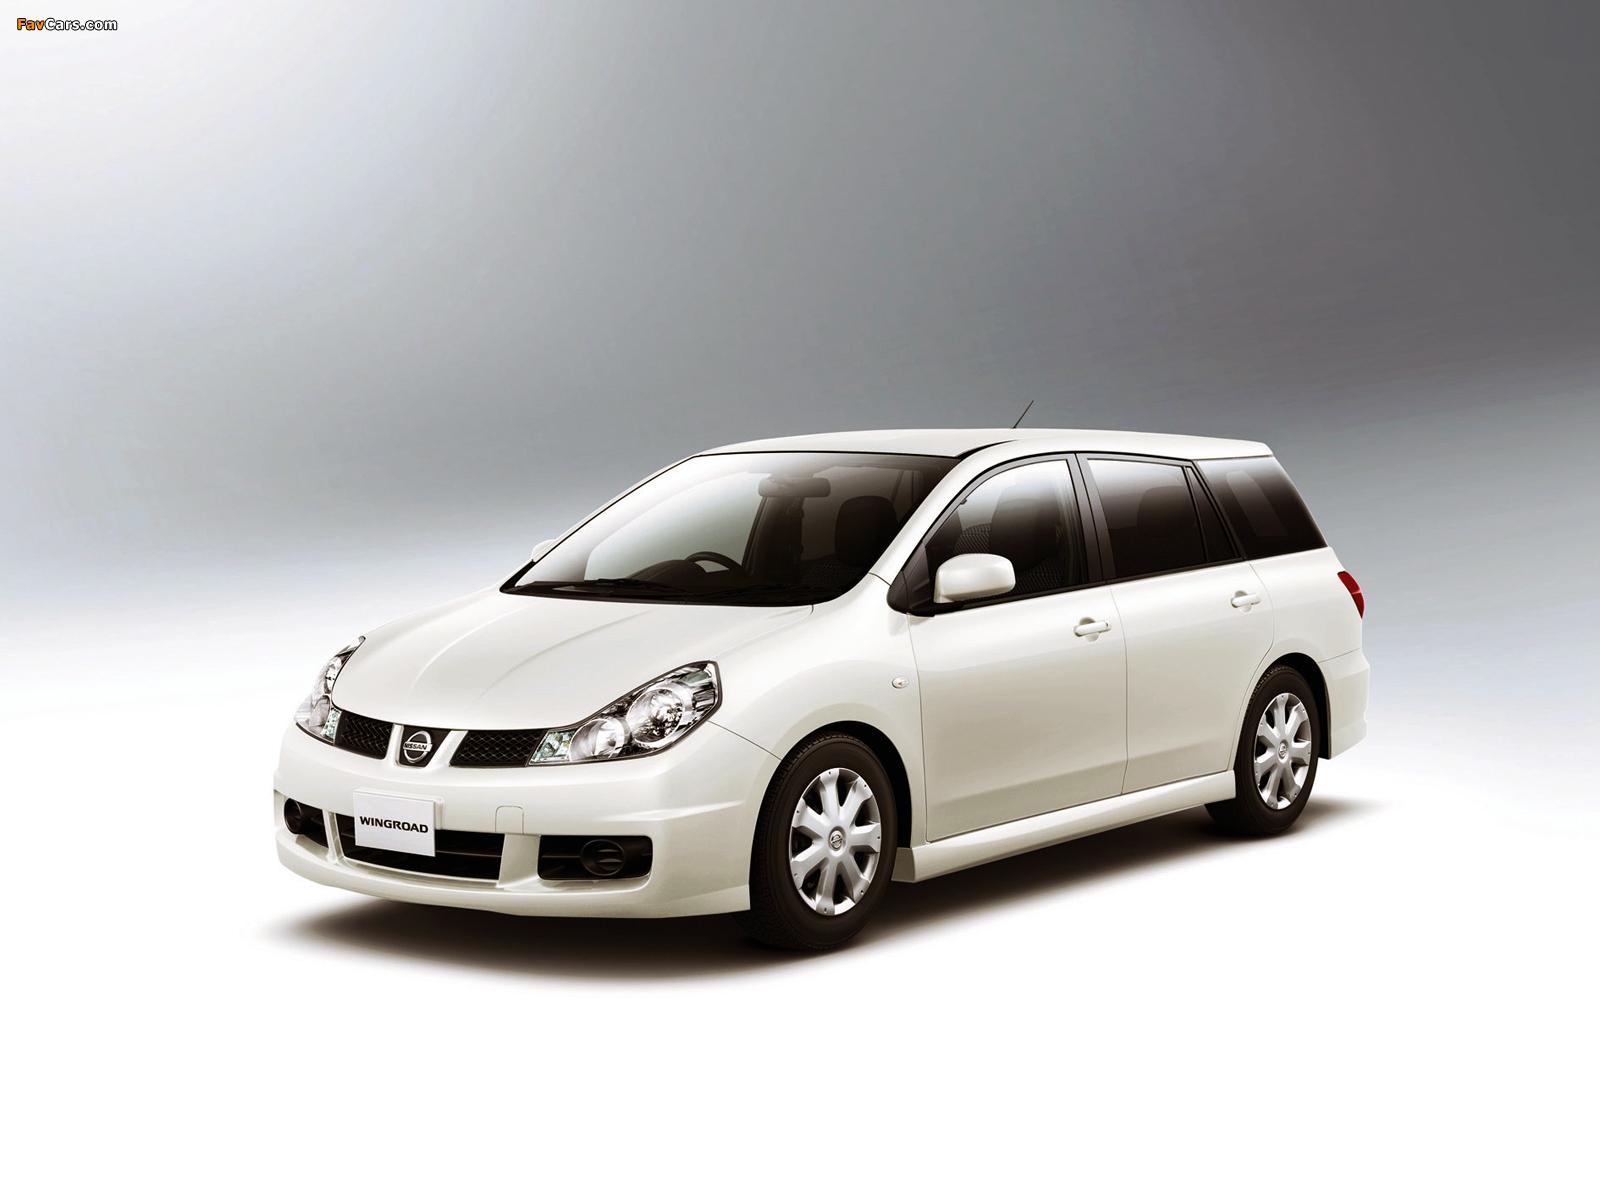 Nissan Wingroad Aero (Y12) 2005 images (1600 x 1200)